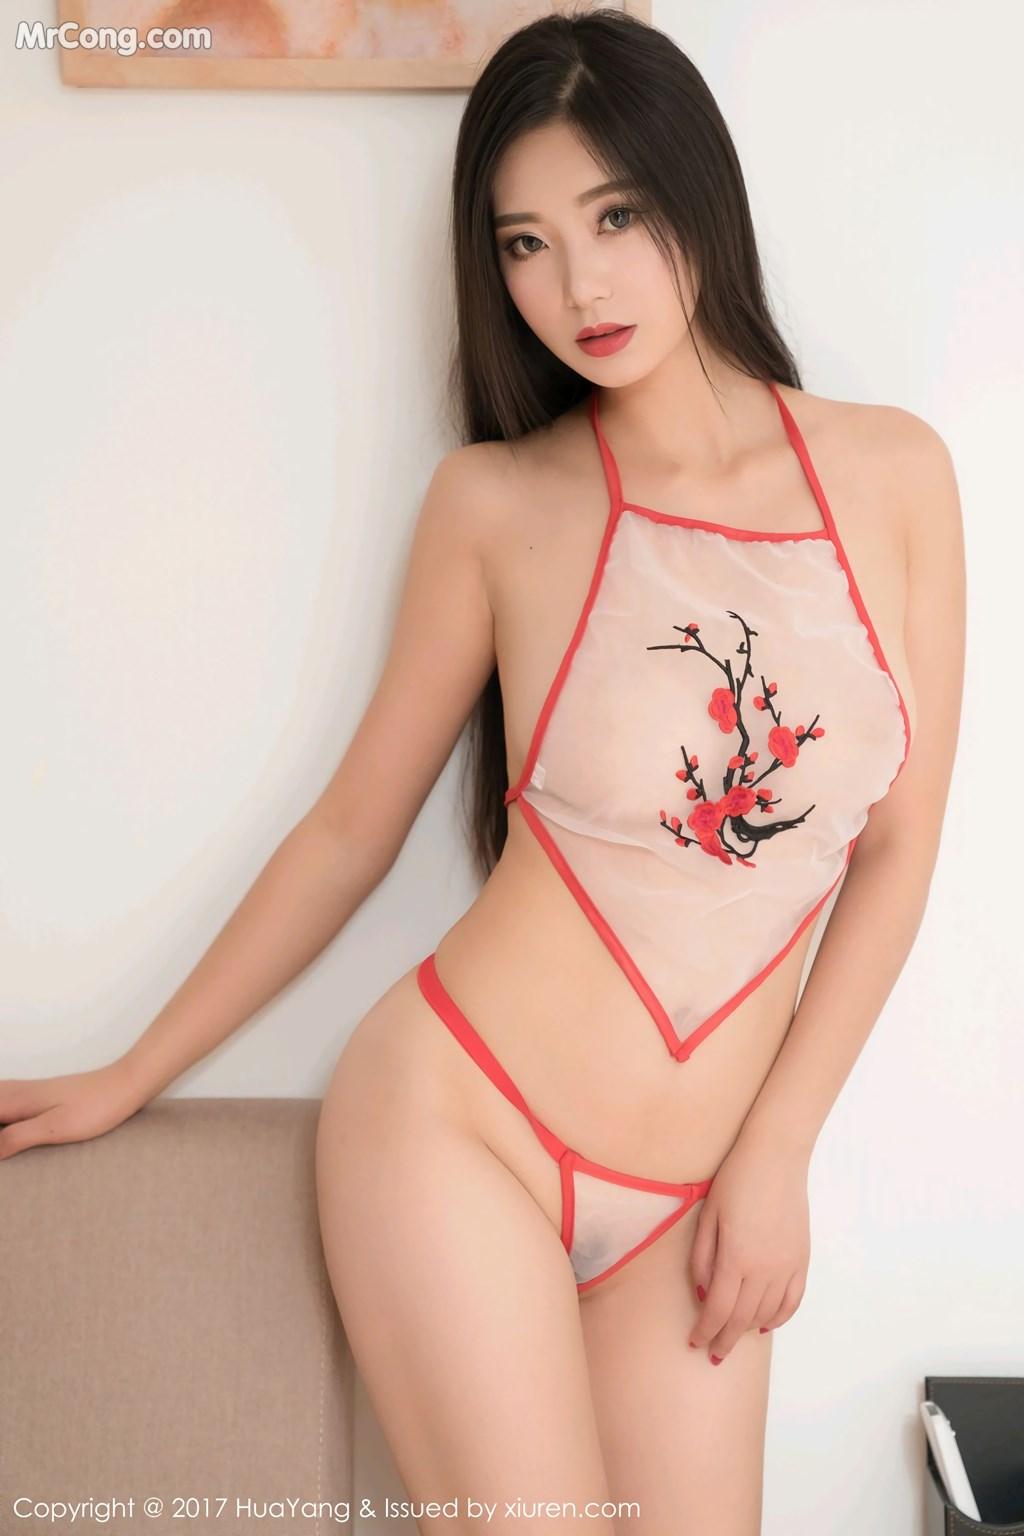 Image HuaYang-2017-11-10-Vol.015-KiKi-MrCong.com-010 in post HuaYang 2017-11-10 Vol.015: Người mẫu 宋-KiKi (45 ảnh)